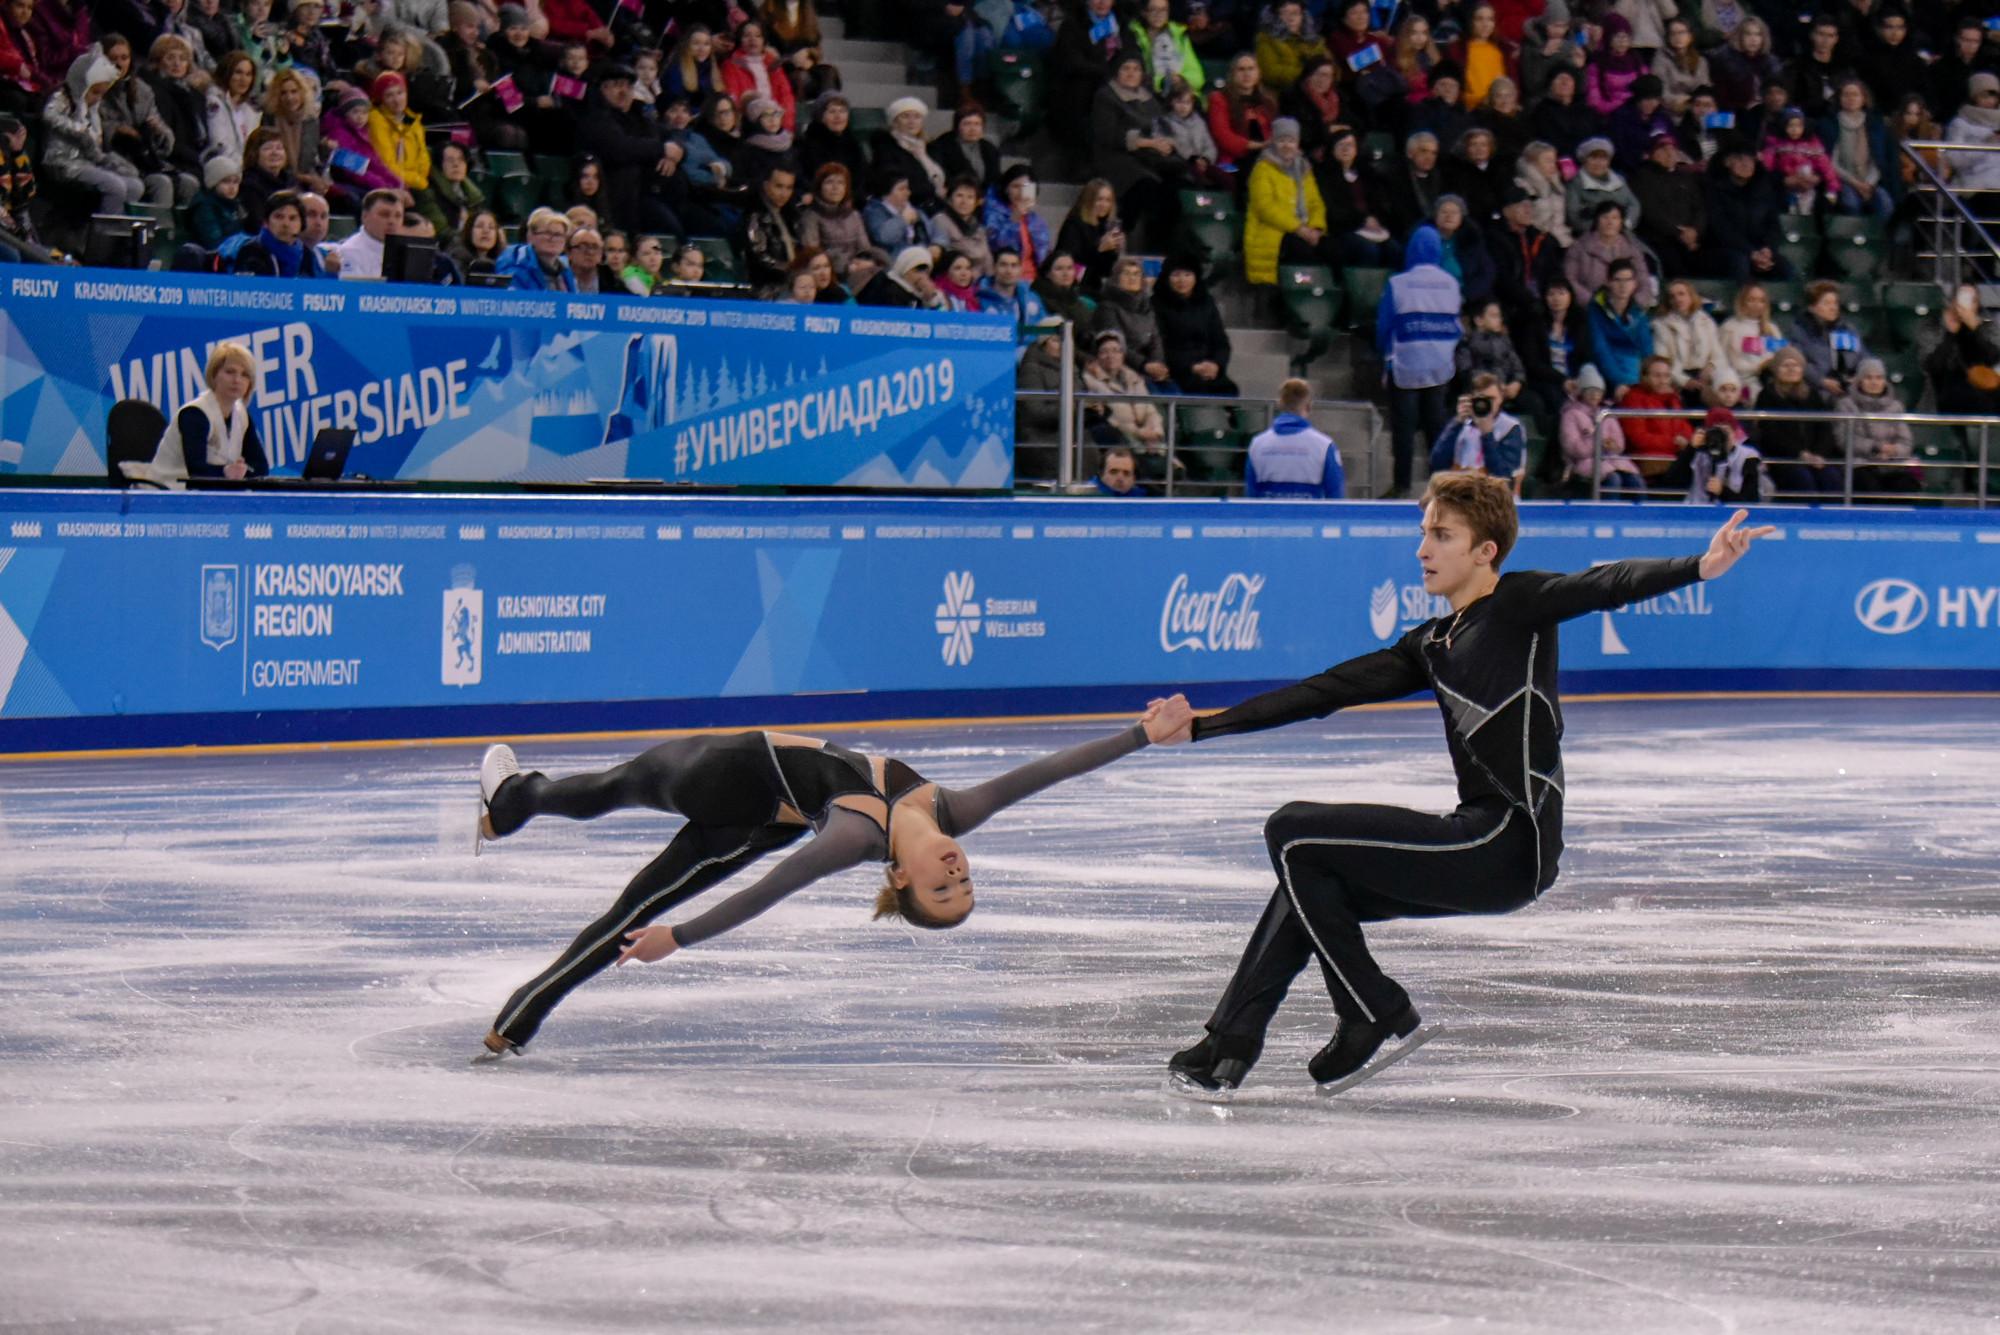 Figure skating competition begins at Krasnoyarsk 2019 Winter Universiade